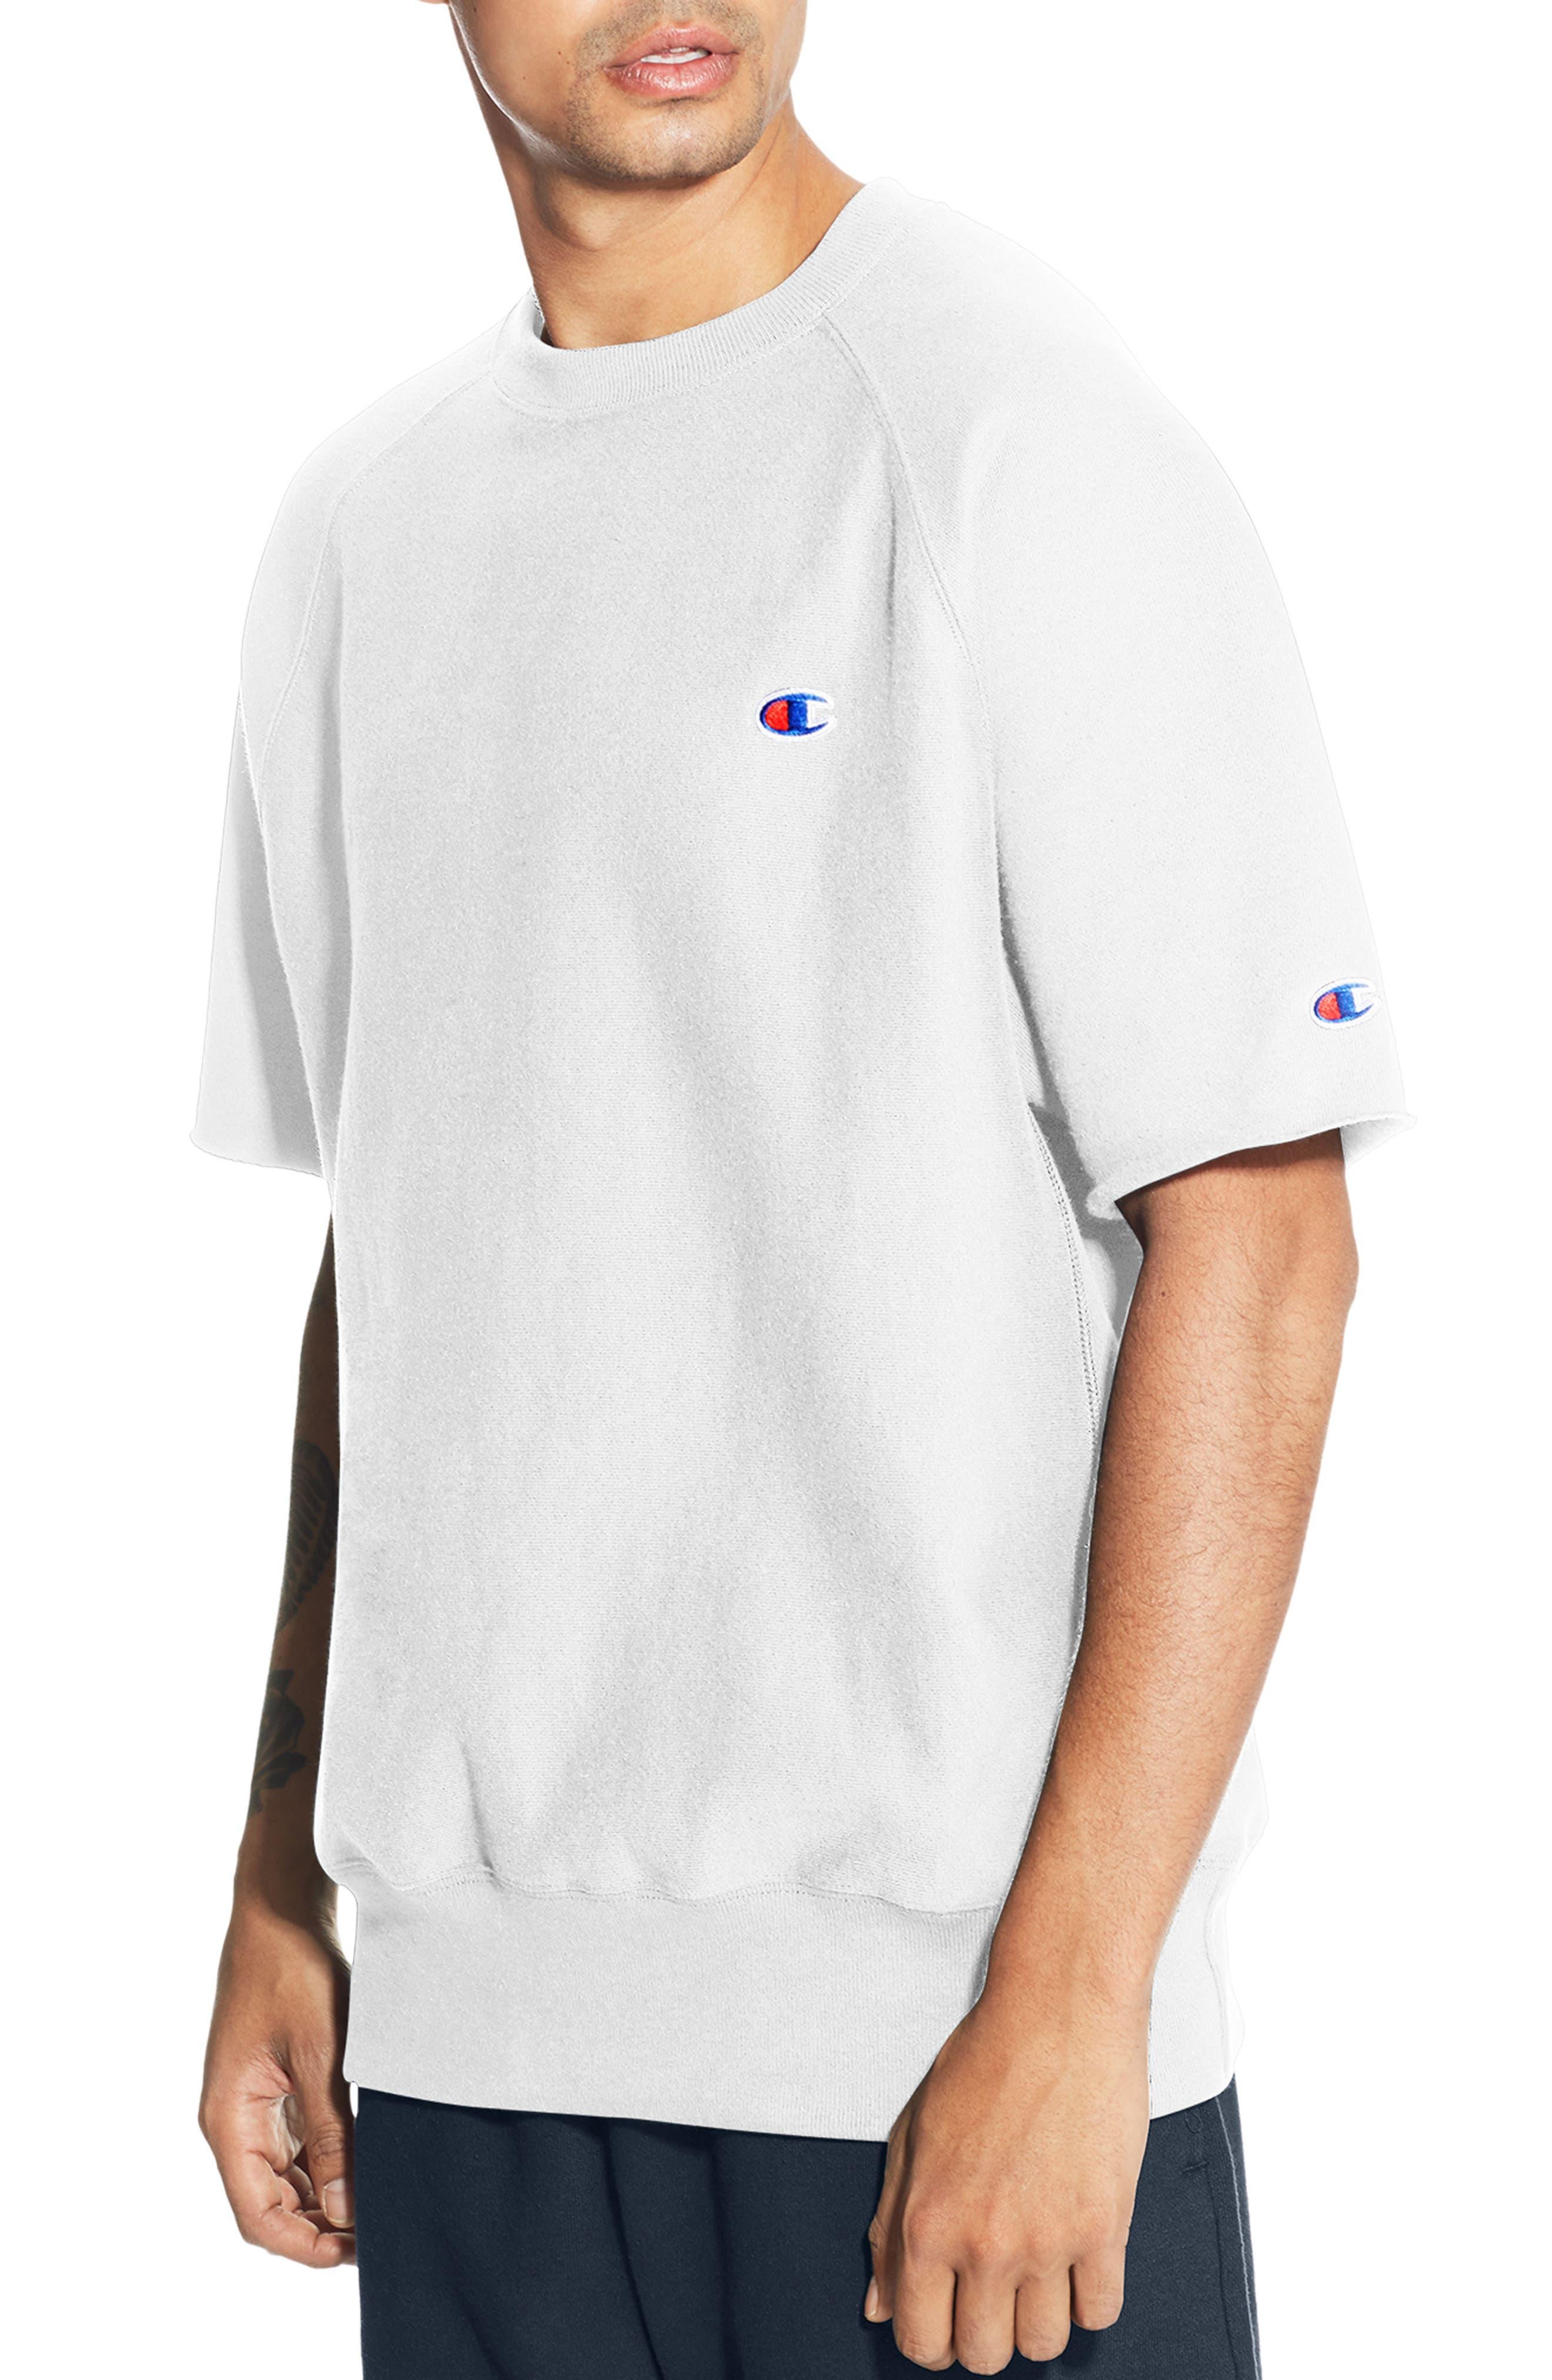 Reverse Weave Short Sleeve Sweatshirt, Main, color, WHITE